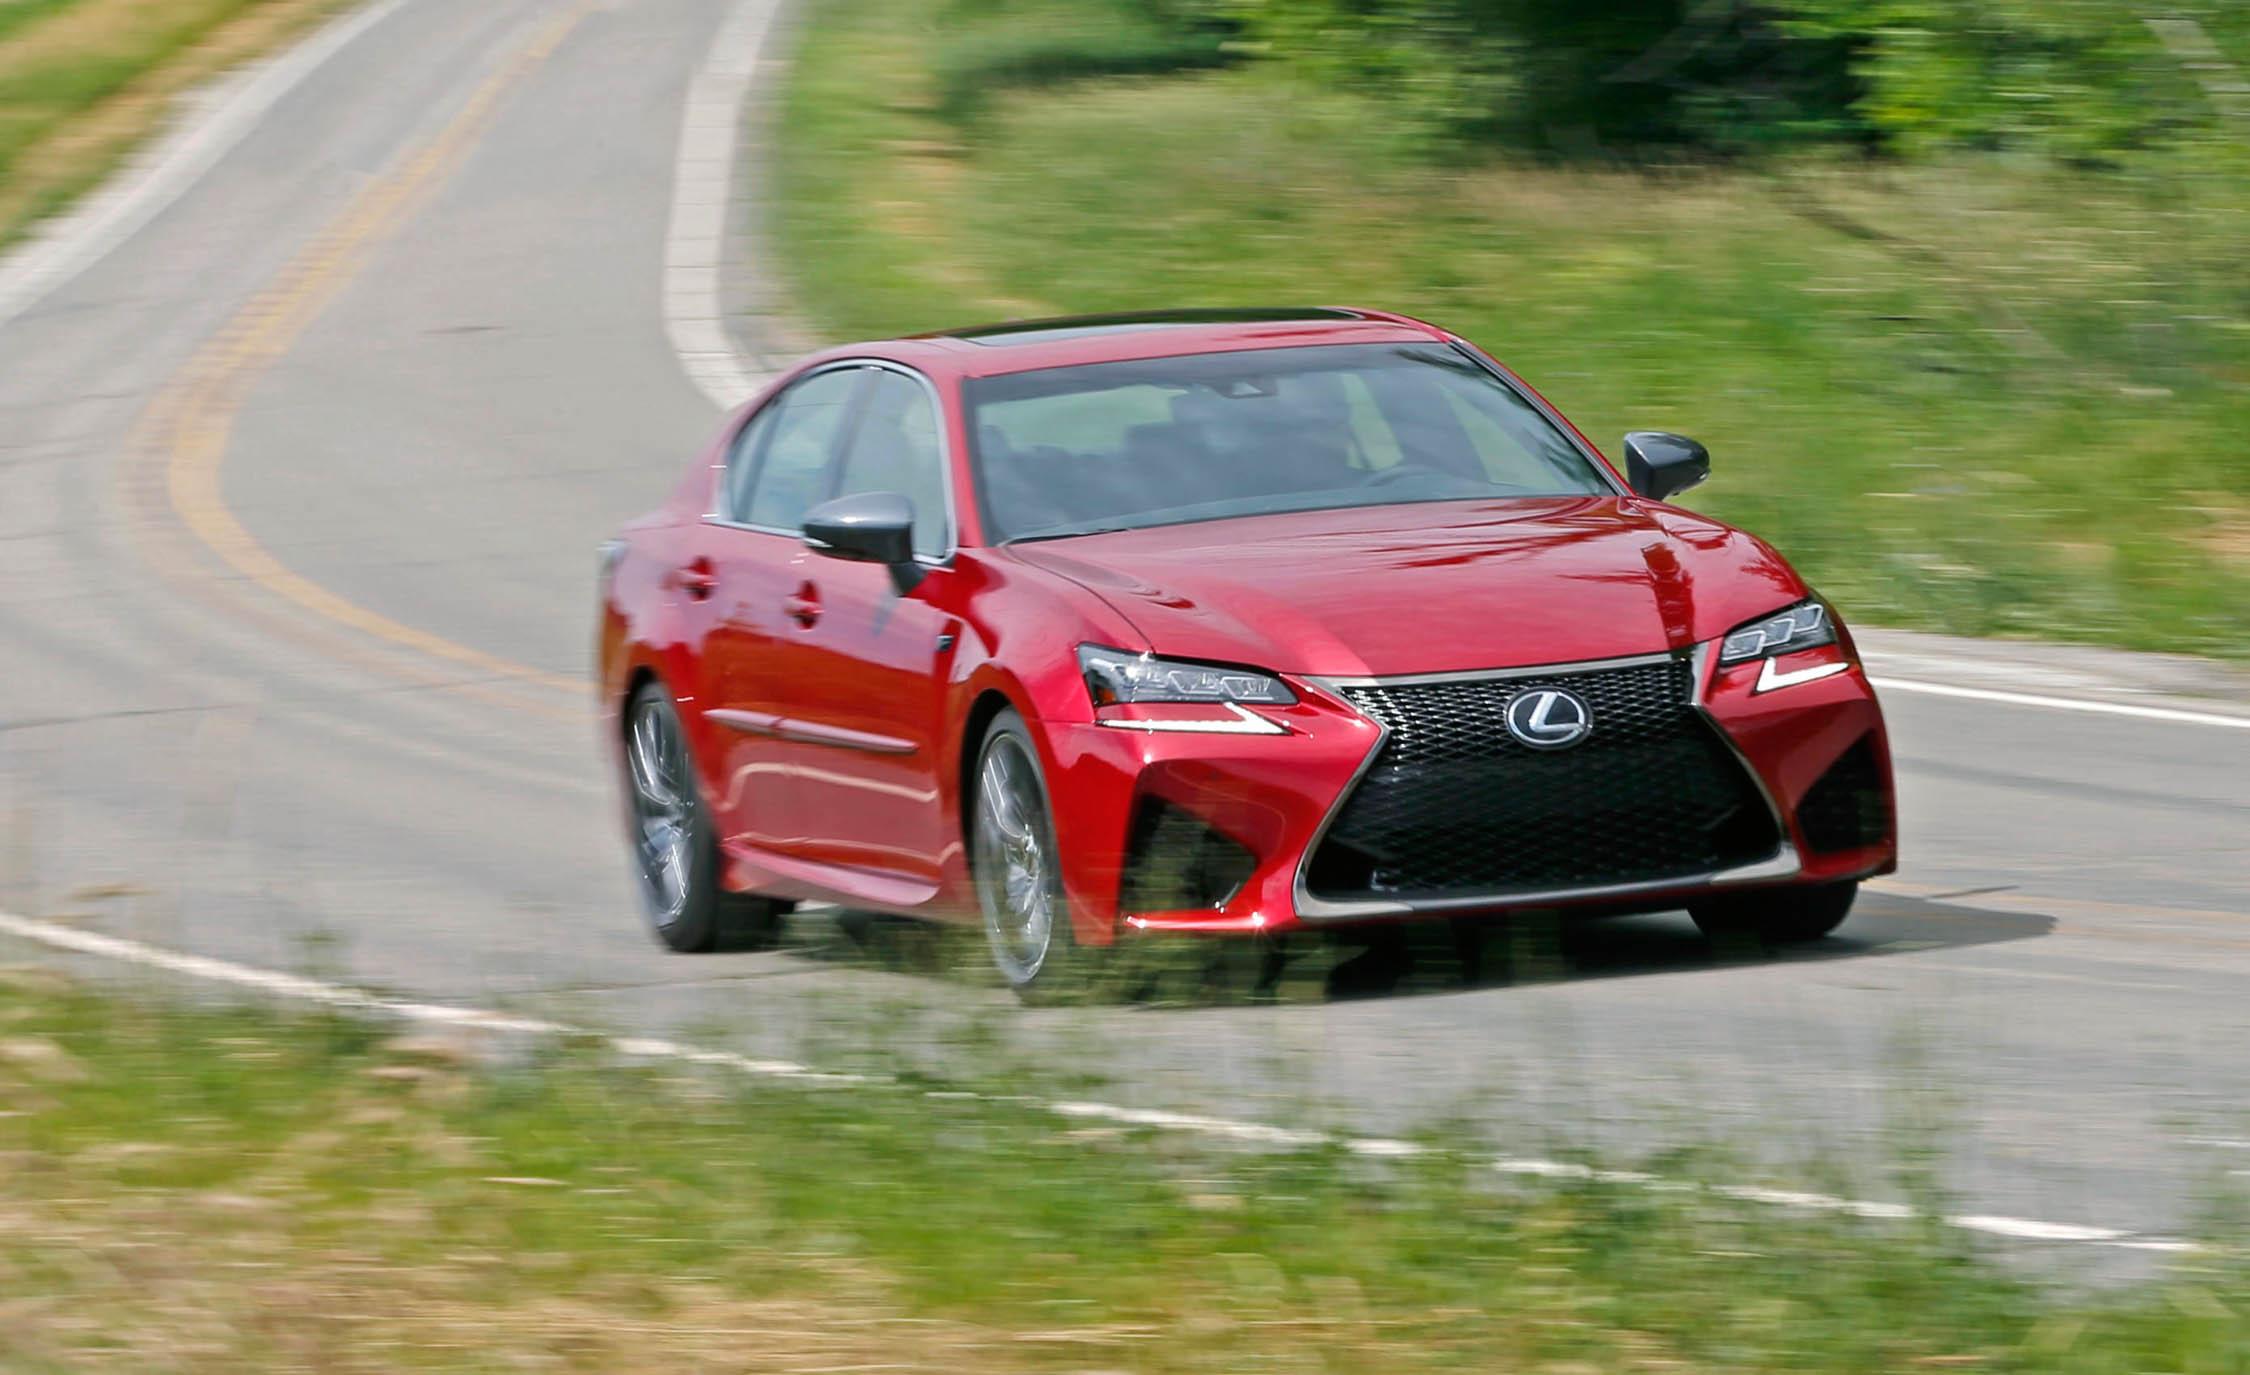 Lexus Gs F  (View 4 of 20)